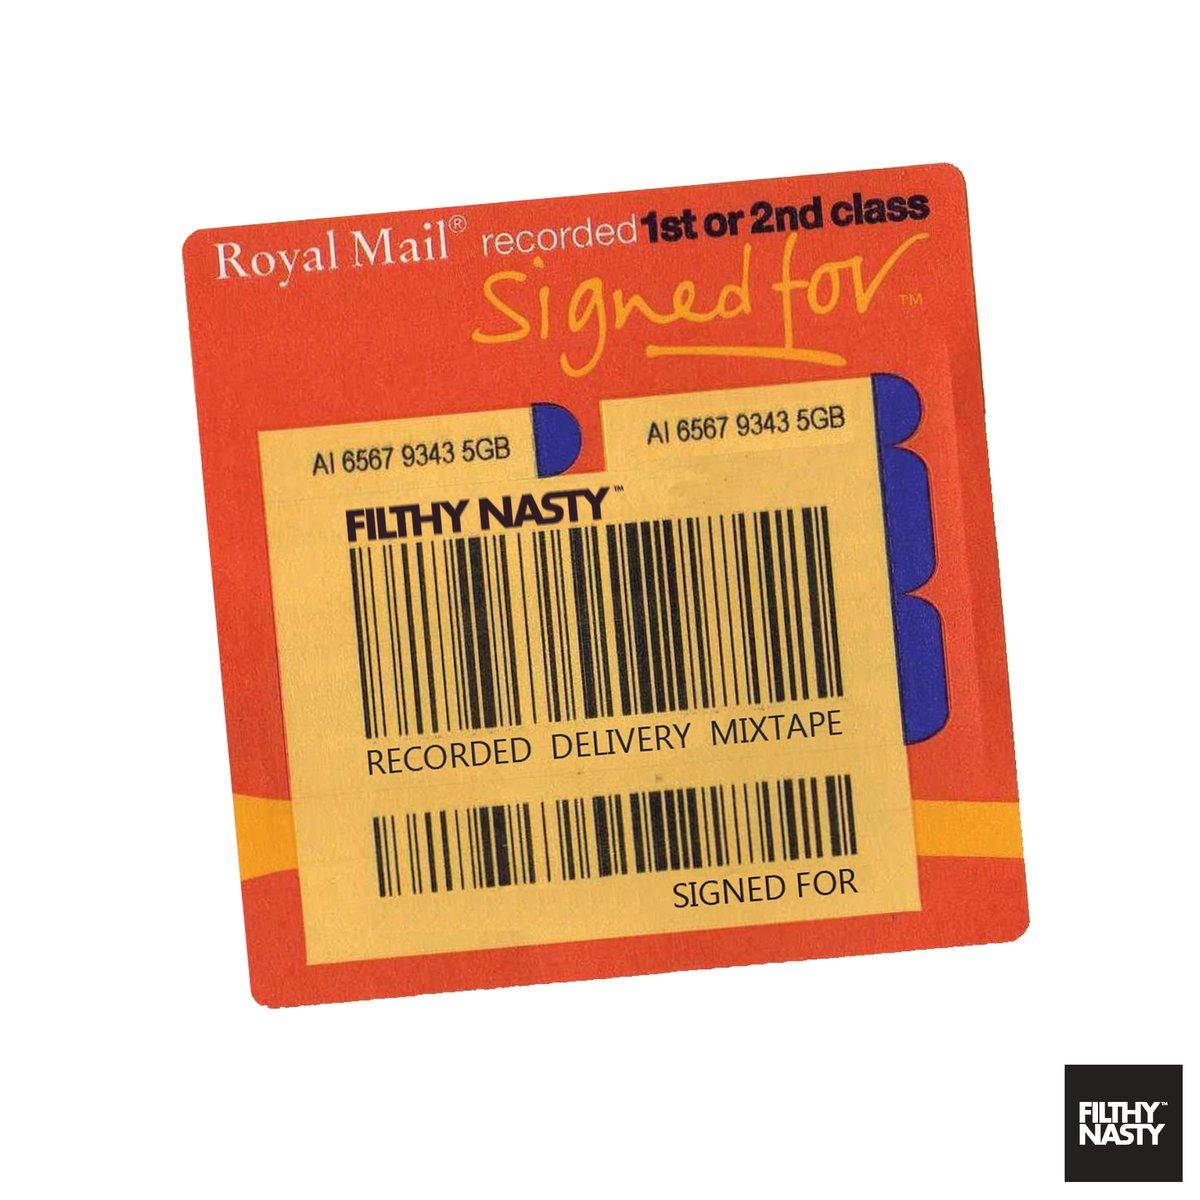 Image of Package Tracking (UK & International)